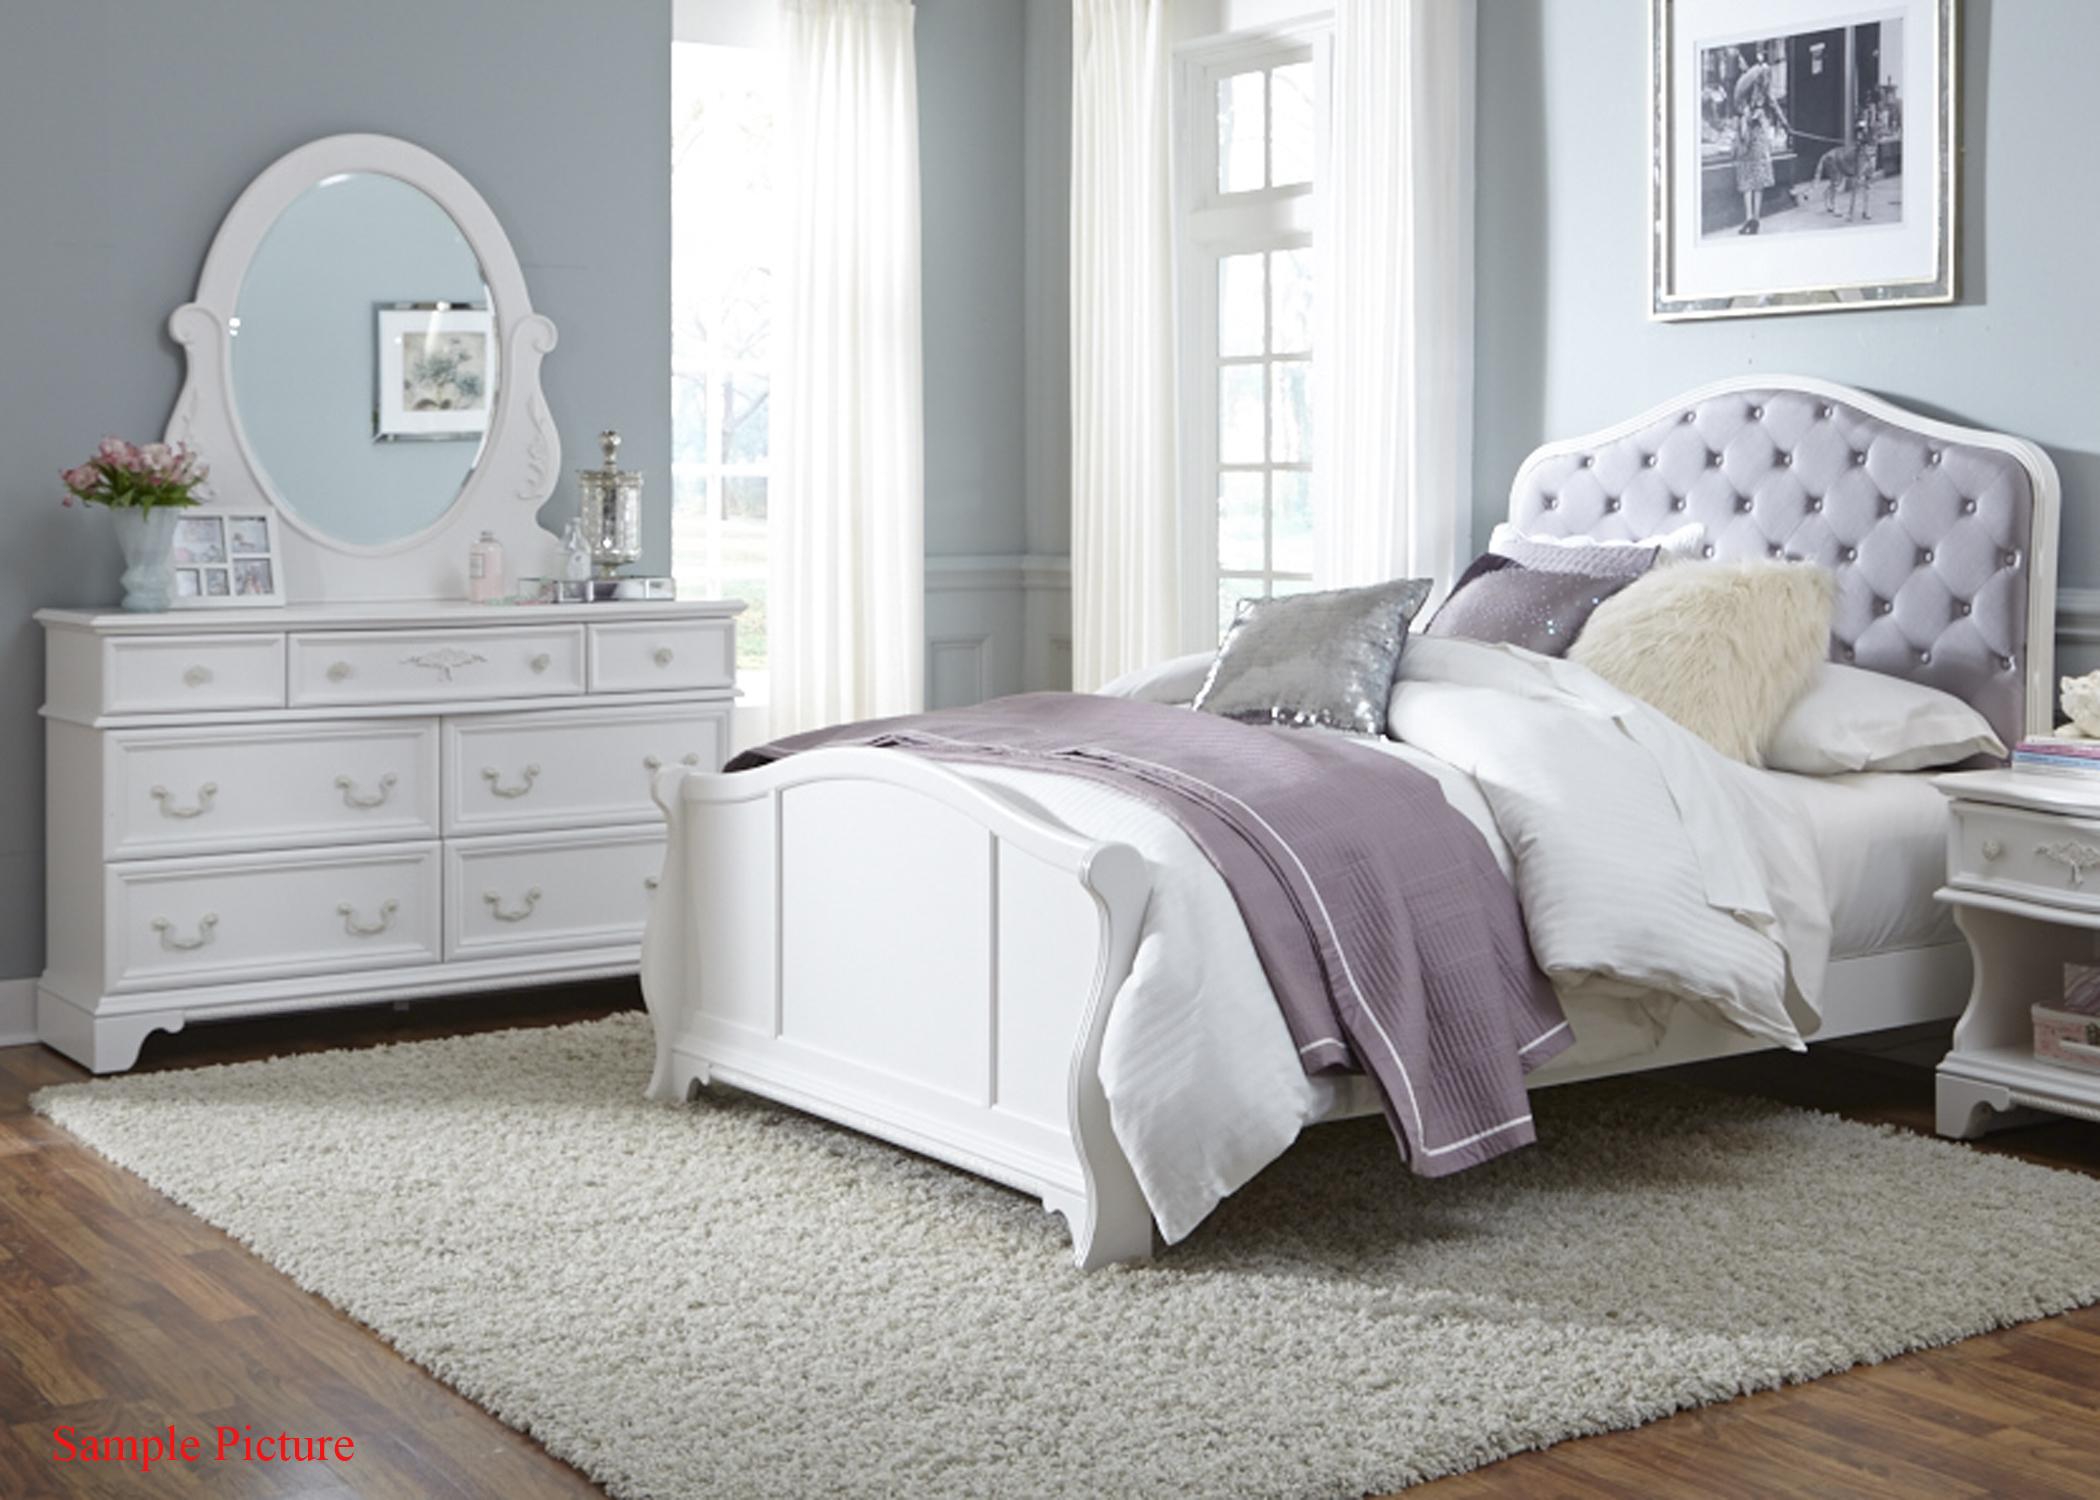 Liberty Furniture Arielle Youth Bedroom 352-YBR-FPBDM Full